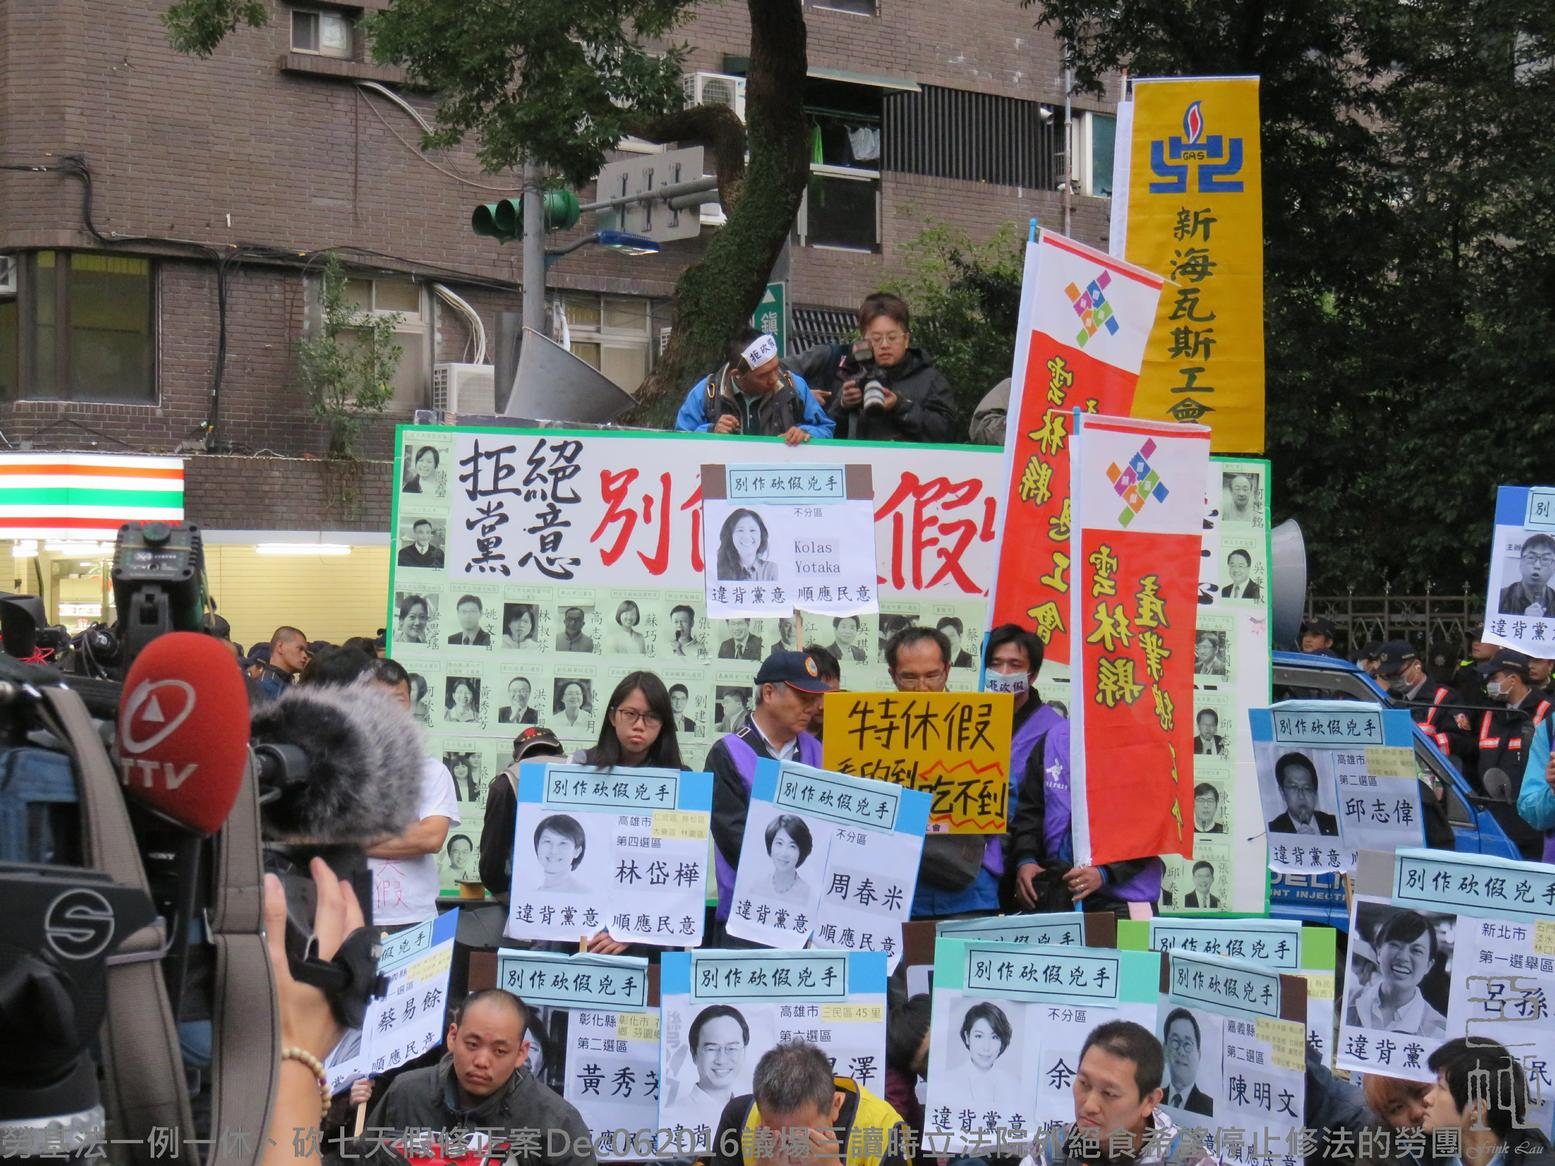 Lau Frink: 蔡英文政府以取消檢舉獎金來應付勞檢人力缺口